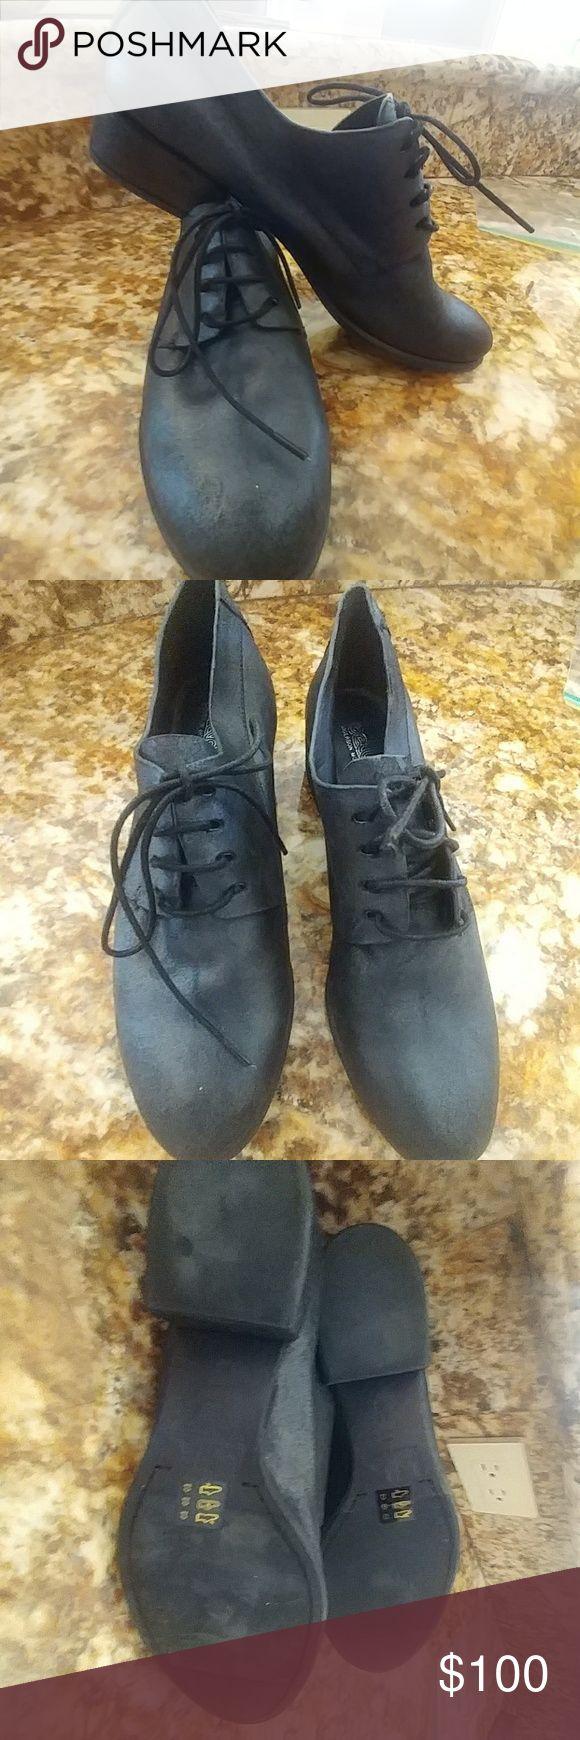 Black Lace Oxfords New Never worn Belle Sigerson Morrison Vero Cuoio. 2013 Season Belle by Sigerson Morrison Shoes Flats & Loafers